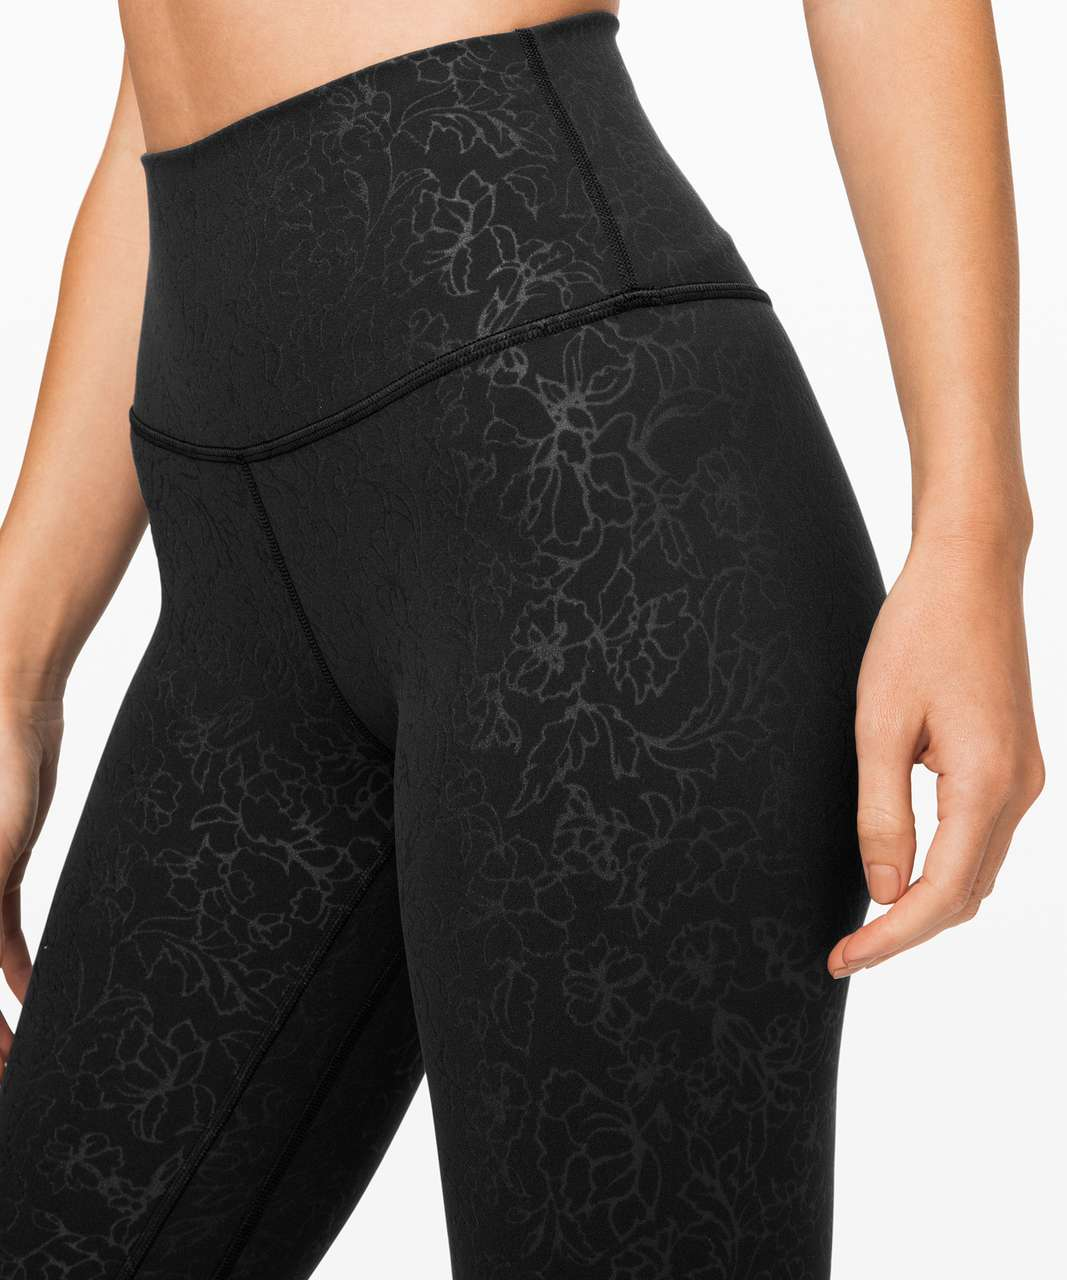 "Lululemon Align Pant II 25"" - Folk Floral Emboss Black Black"